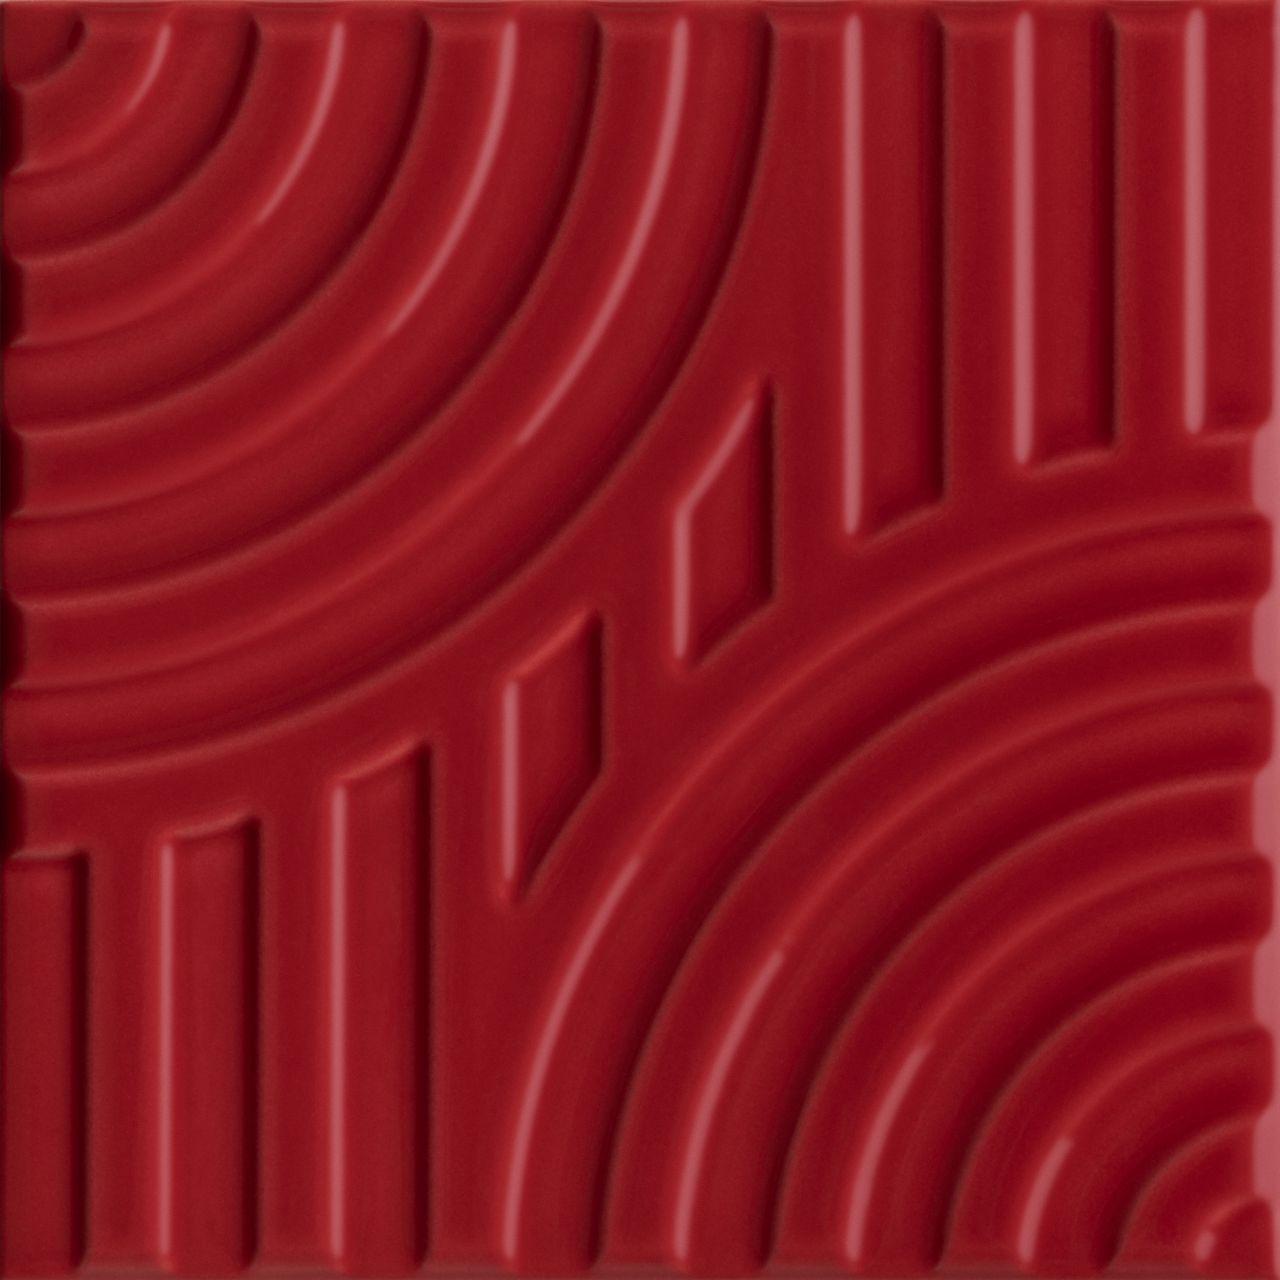 poente arco vermelho br 15,5×15,5